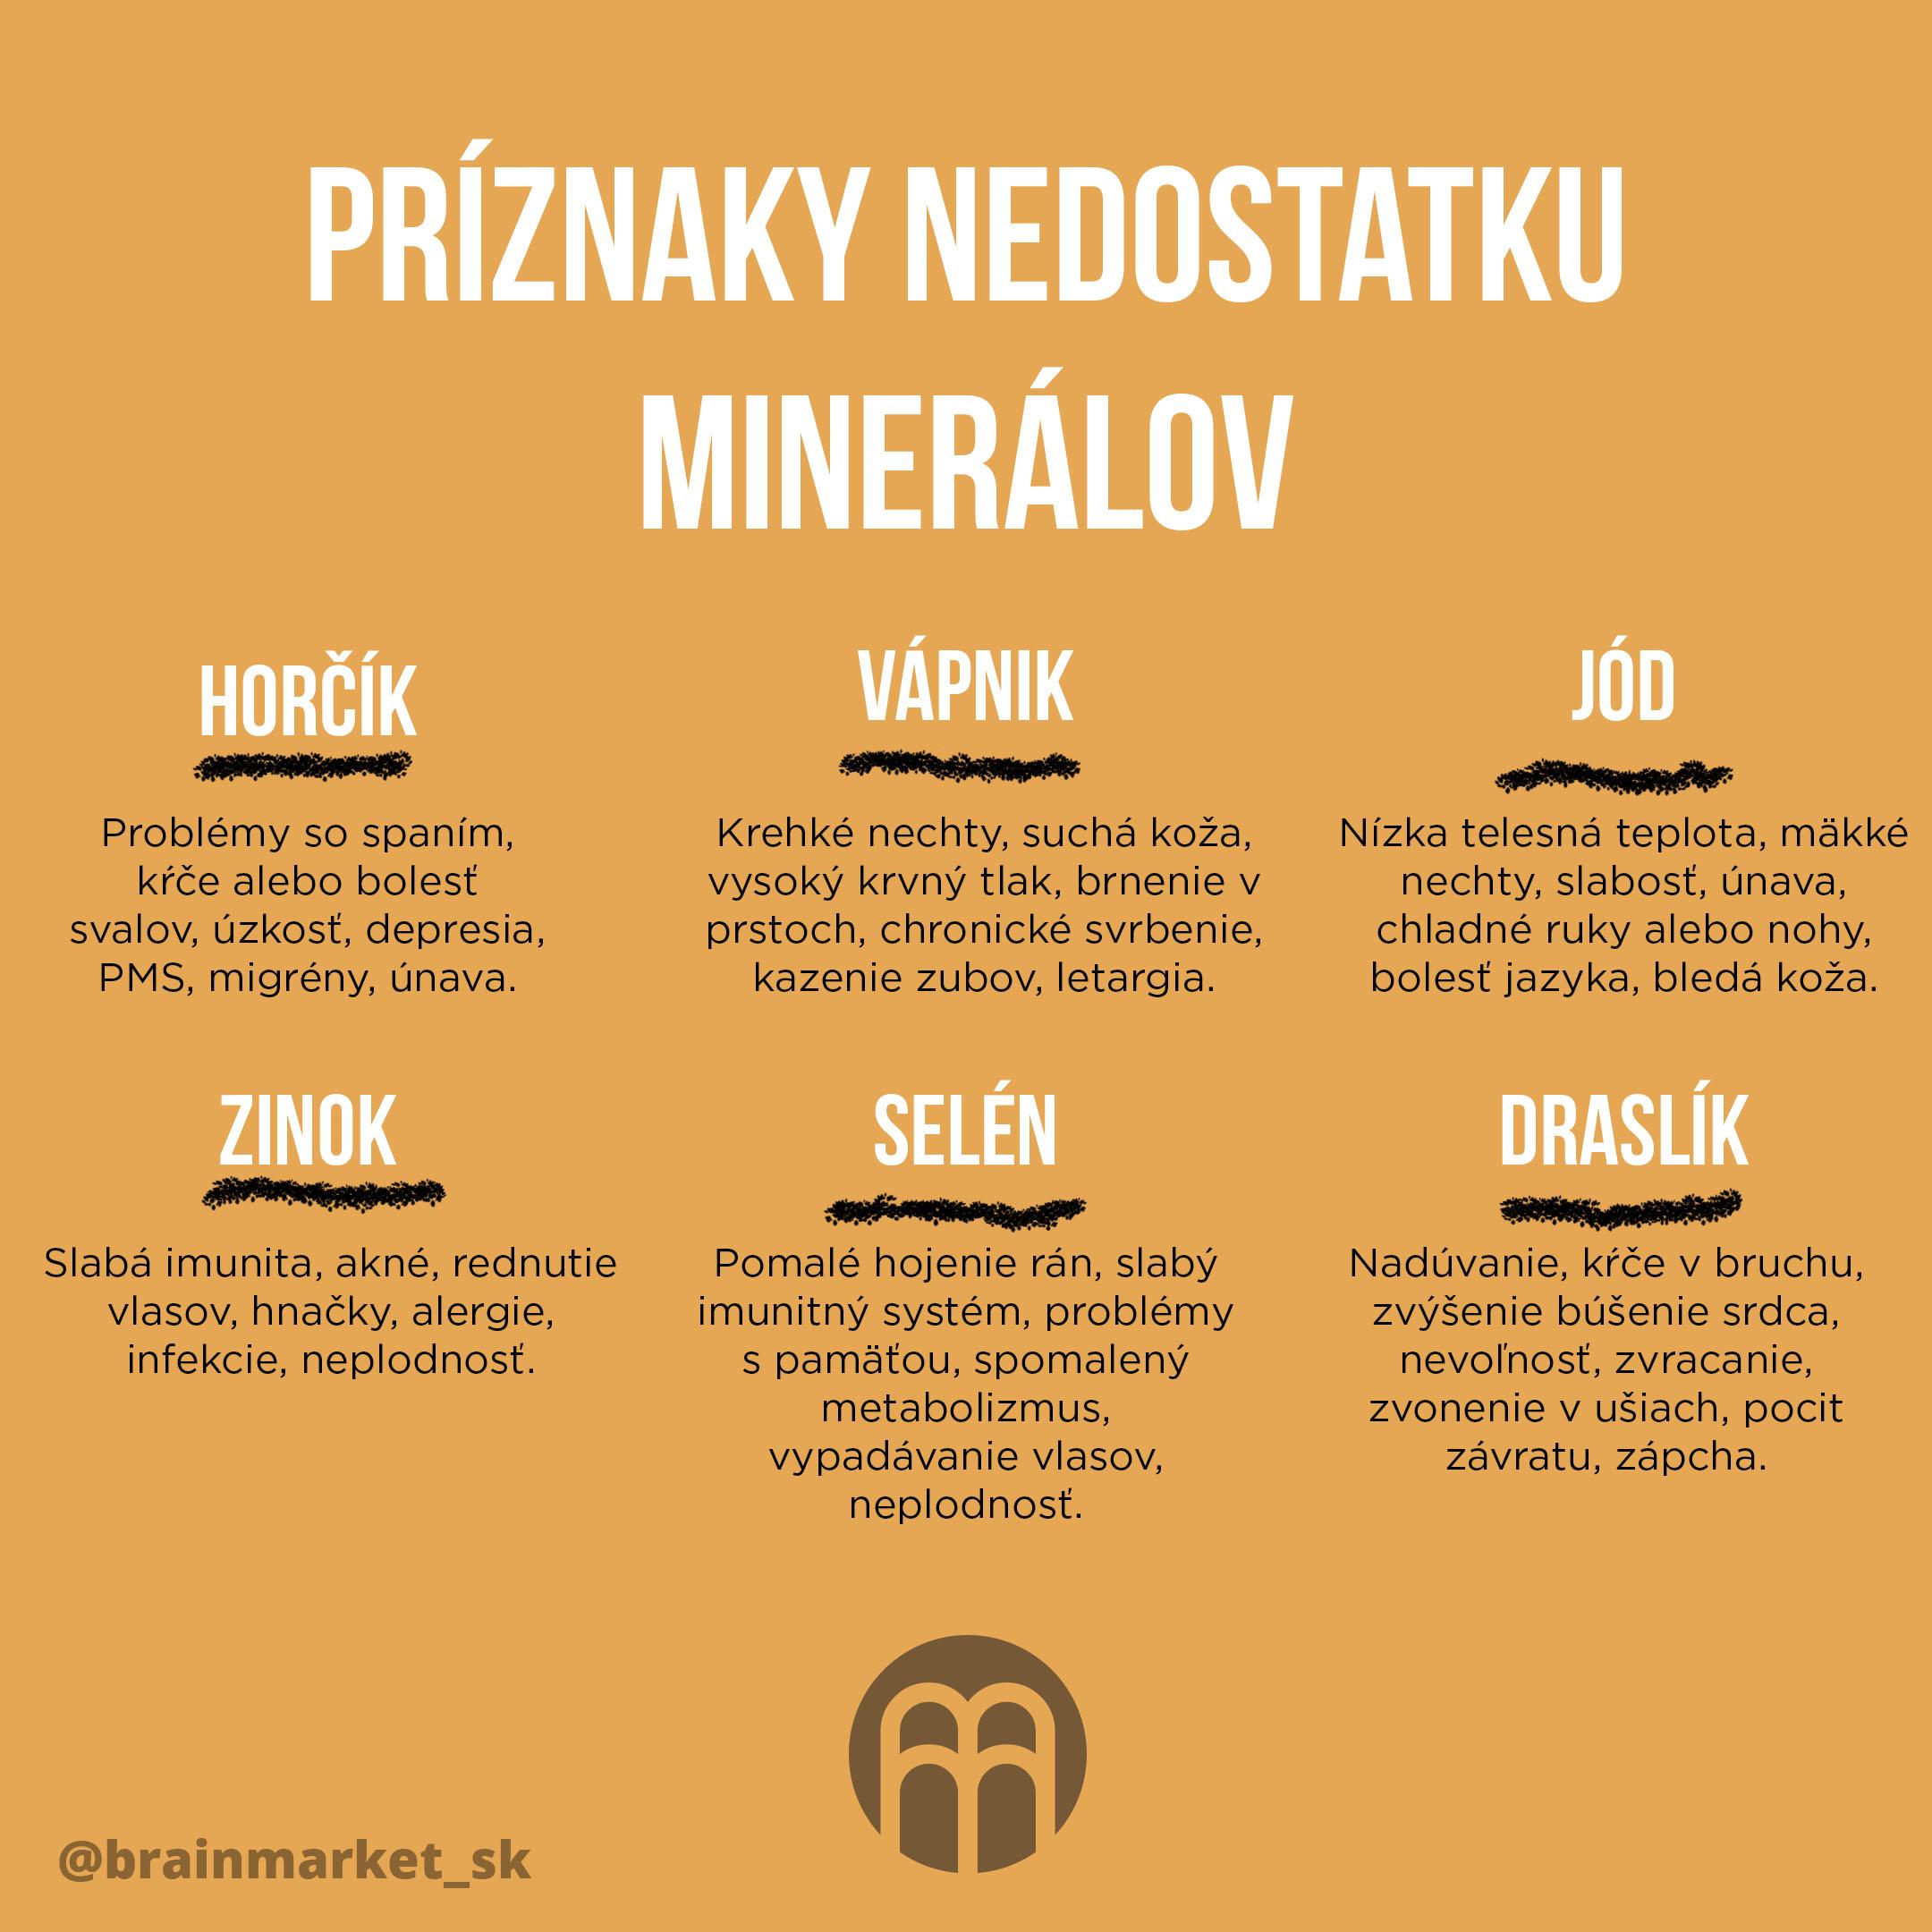 c6fffc85a6u67293-nedostatek-mineralu-infografika-brainmakret-sk